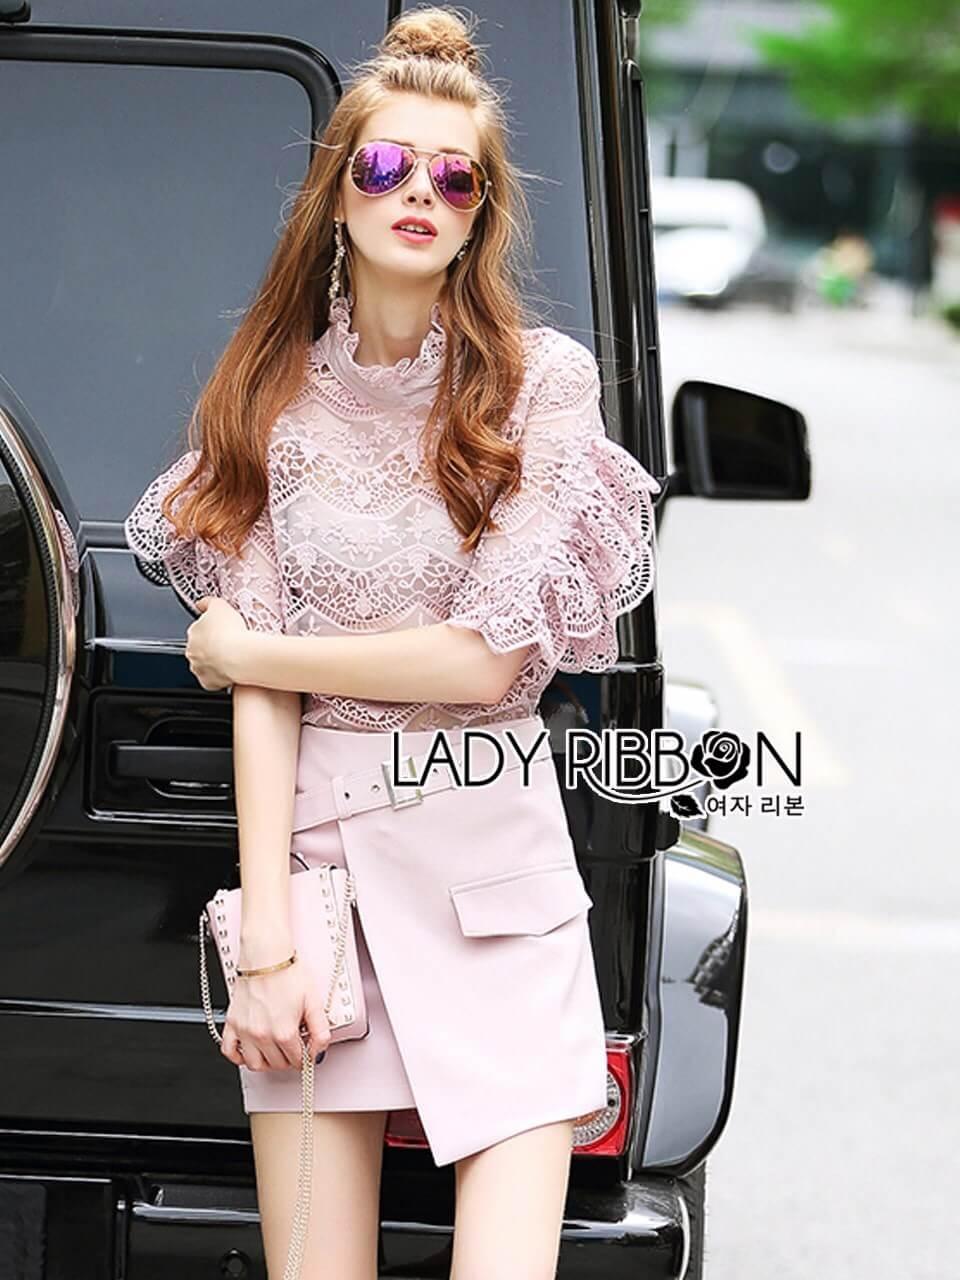 &#x1F380 Lady Ribbon's Made &#x1F380 Lady Christina Modern Vintage Lace Blouse and Hot skirt Set